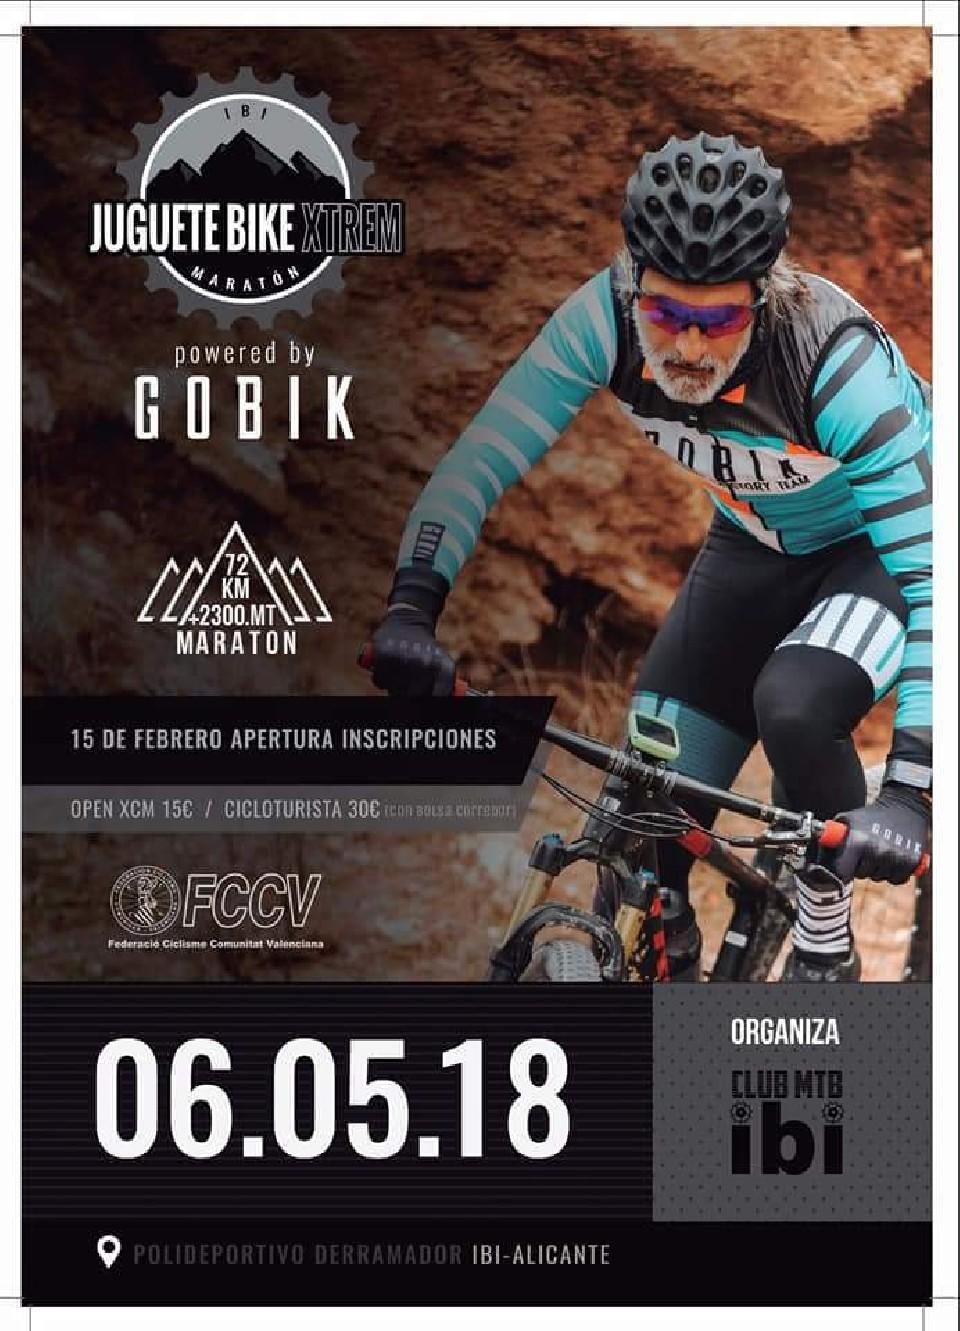 Maratón/Open Juguete Bike Xtrem Ibi